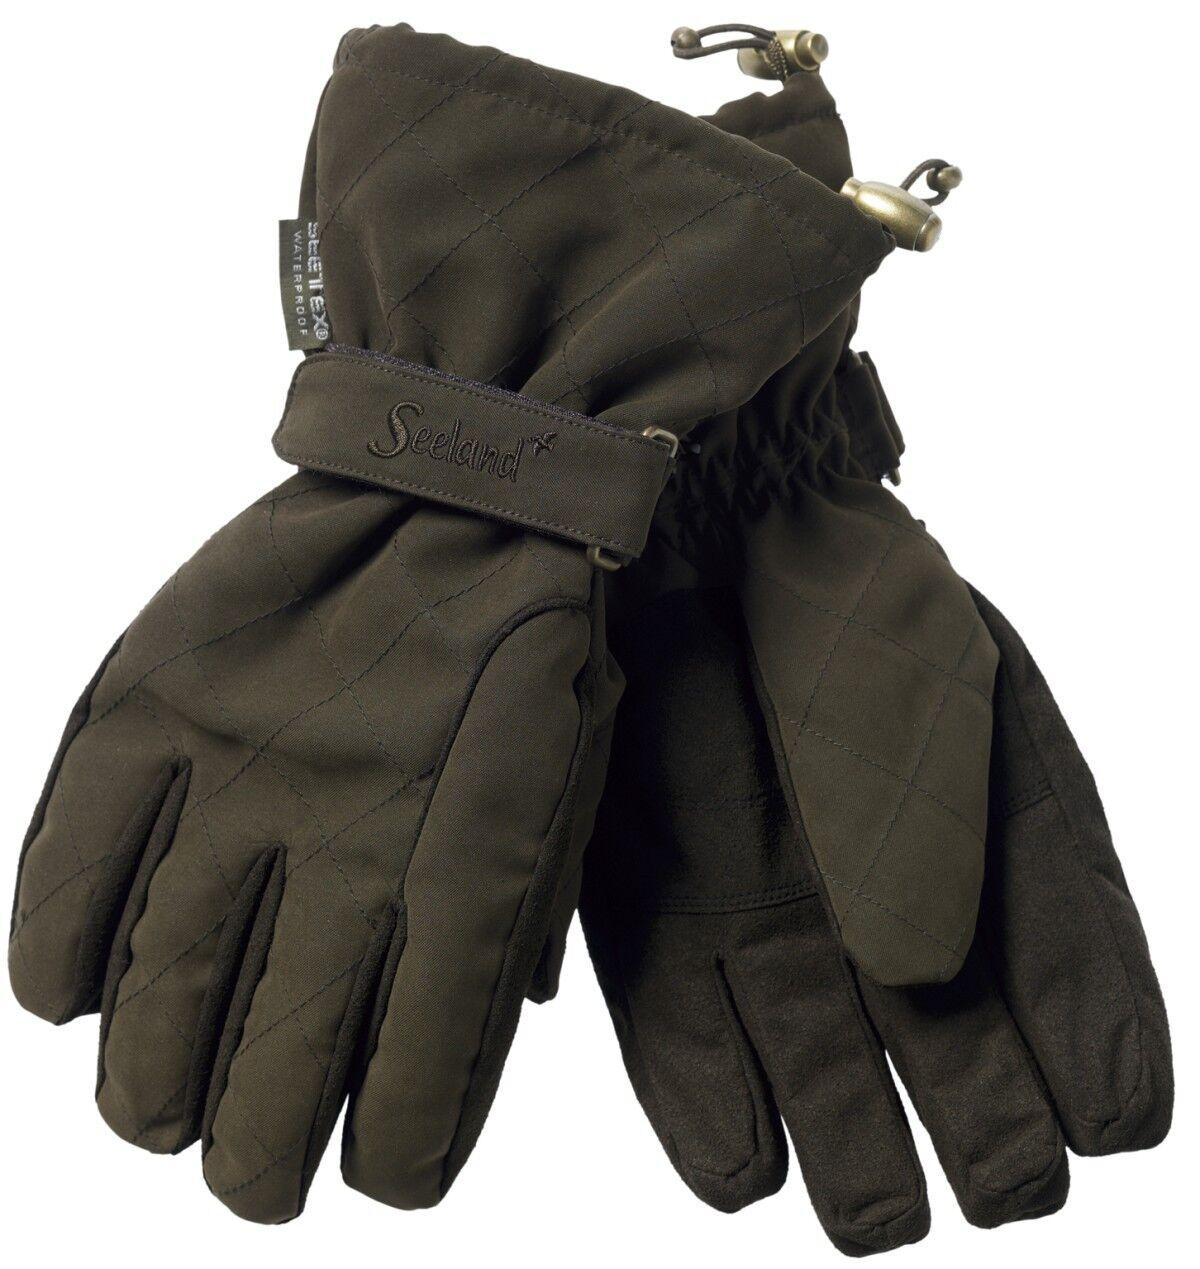 SEELAND Fingerhandschuhe GLENSBURY - Seetex-Membrane 2 in 1 mit Innnenhandschuh